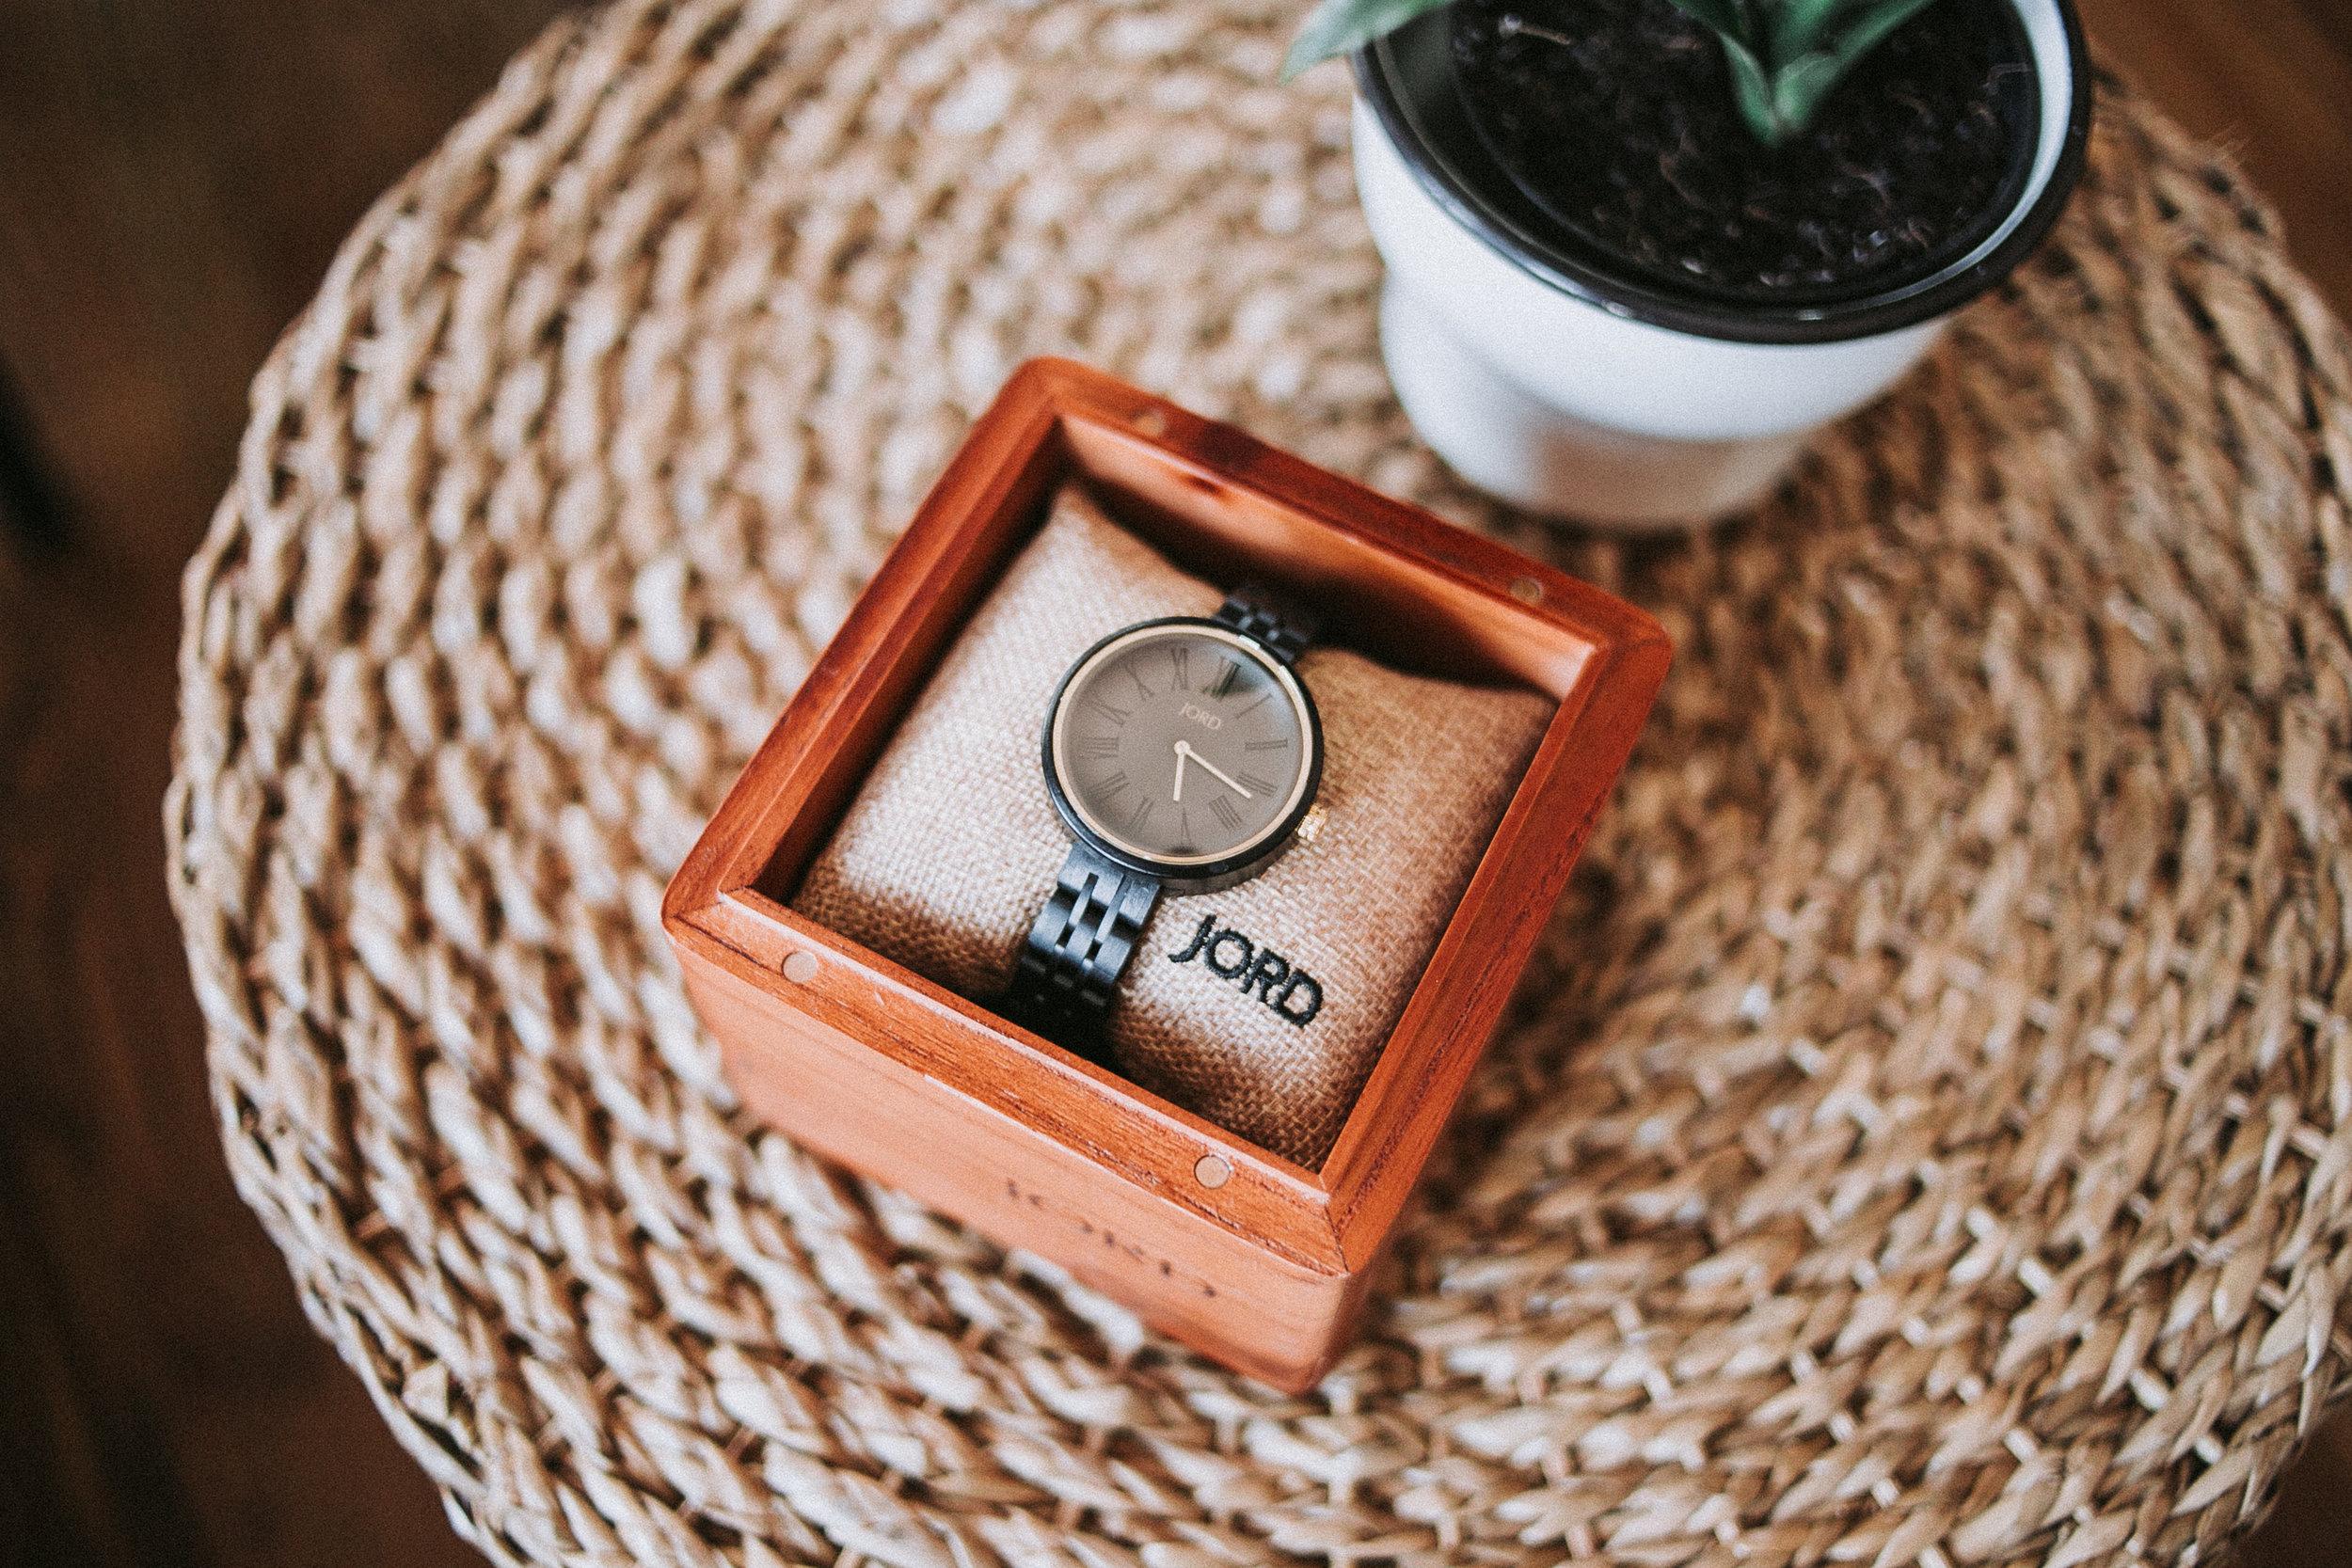 Jord Watches minimal design in wood box